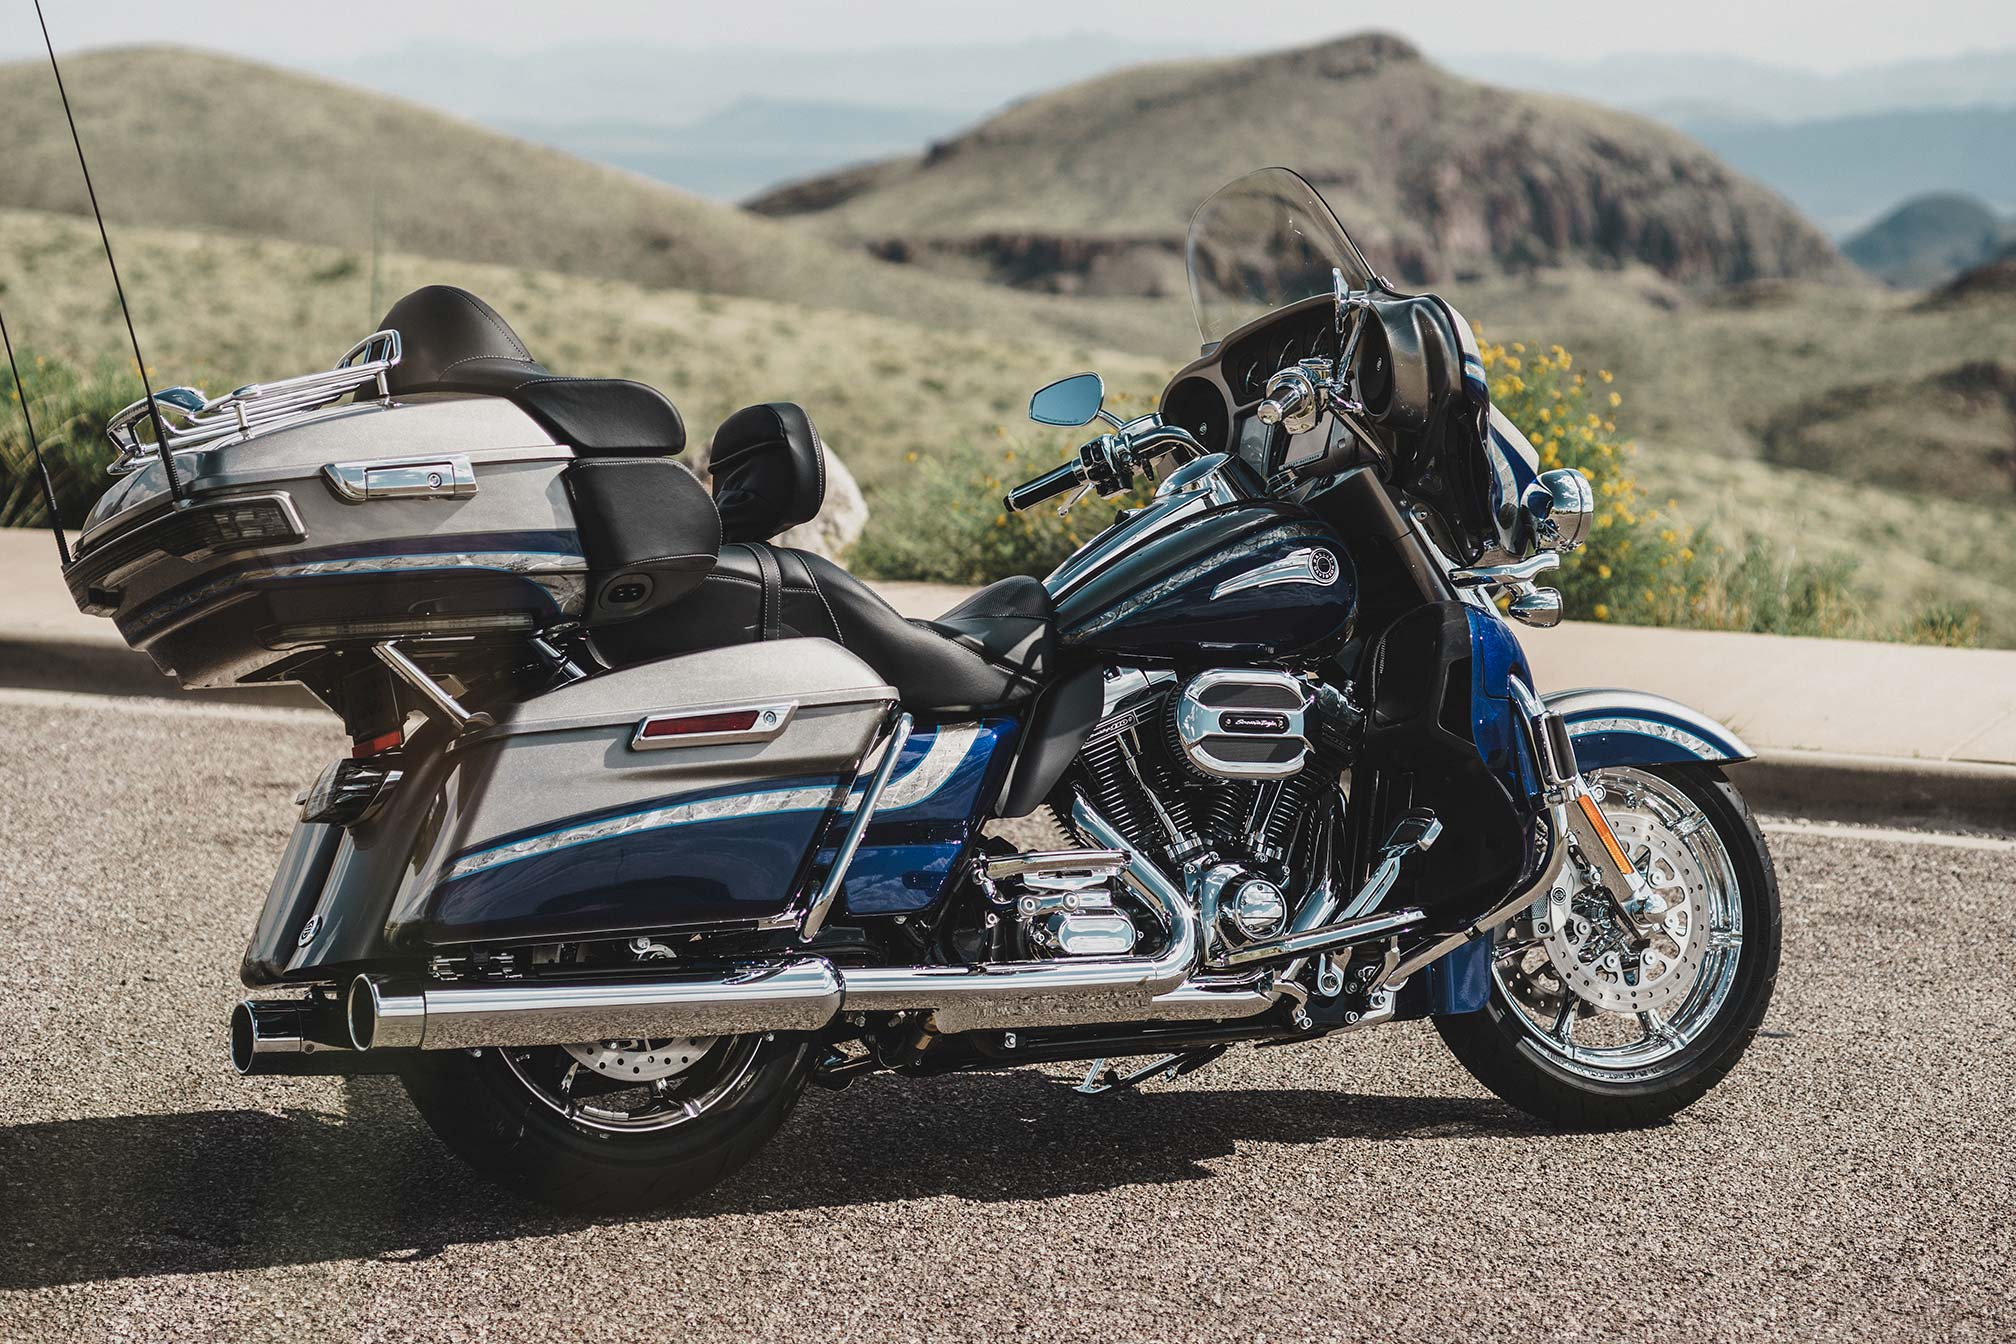 Harley Davidson: CVO Harley-Davidson Wallpapers